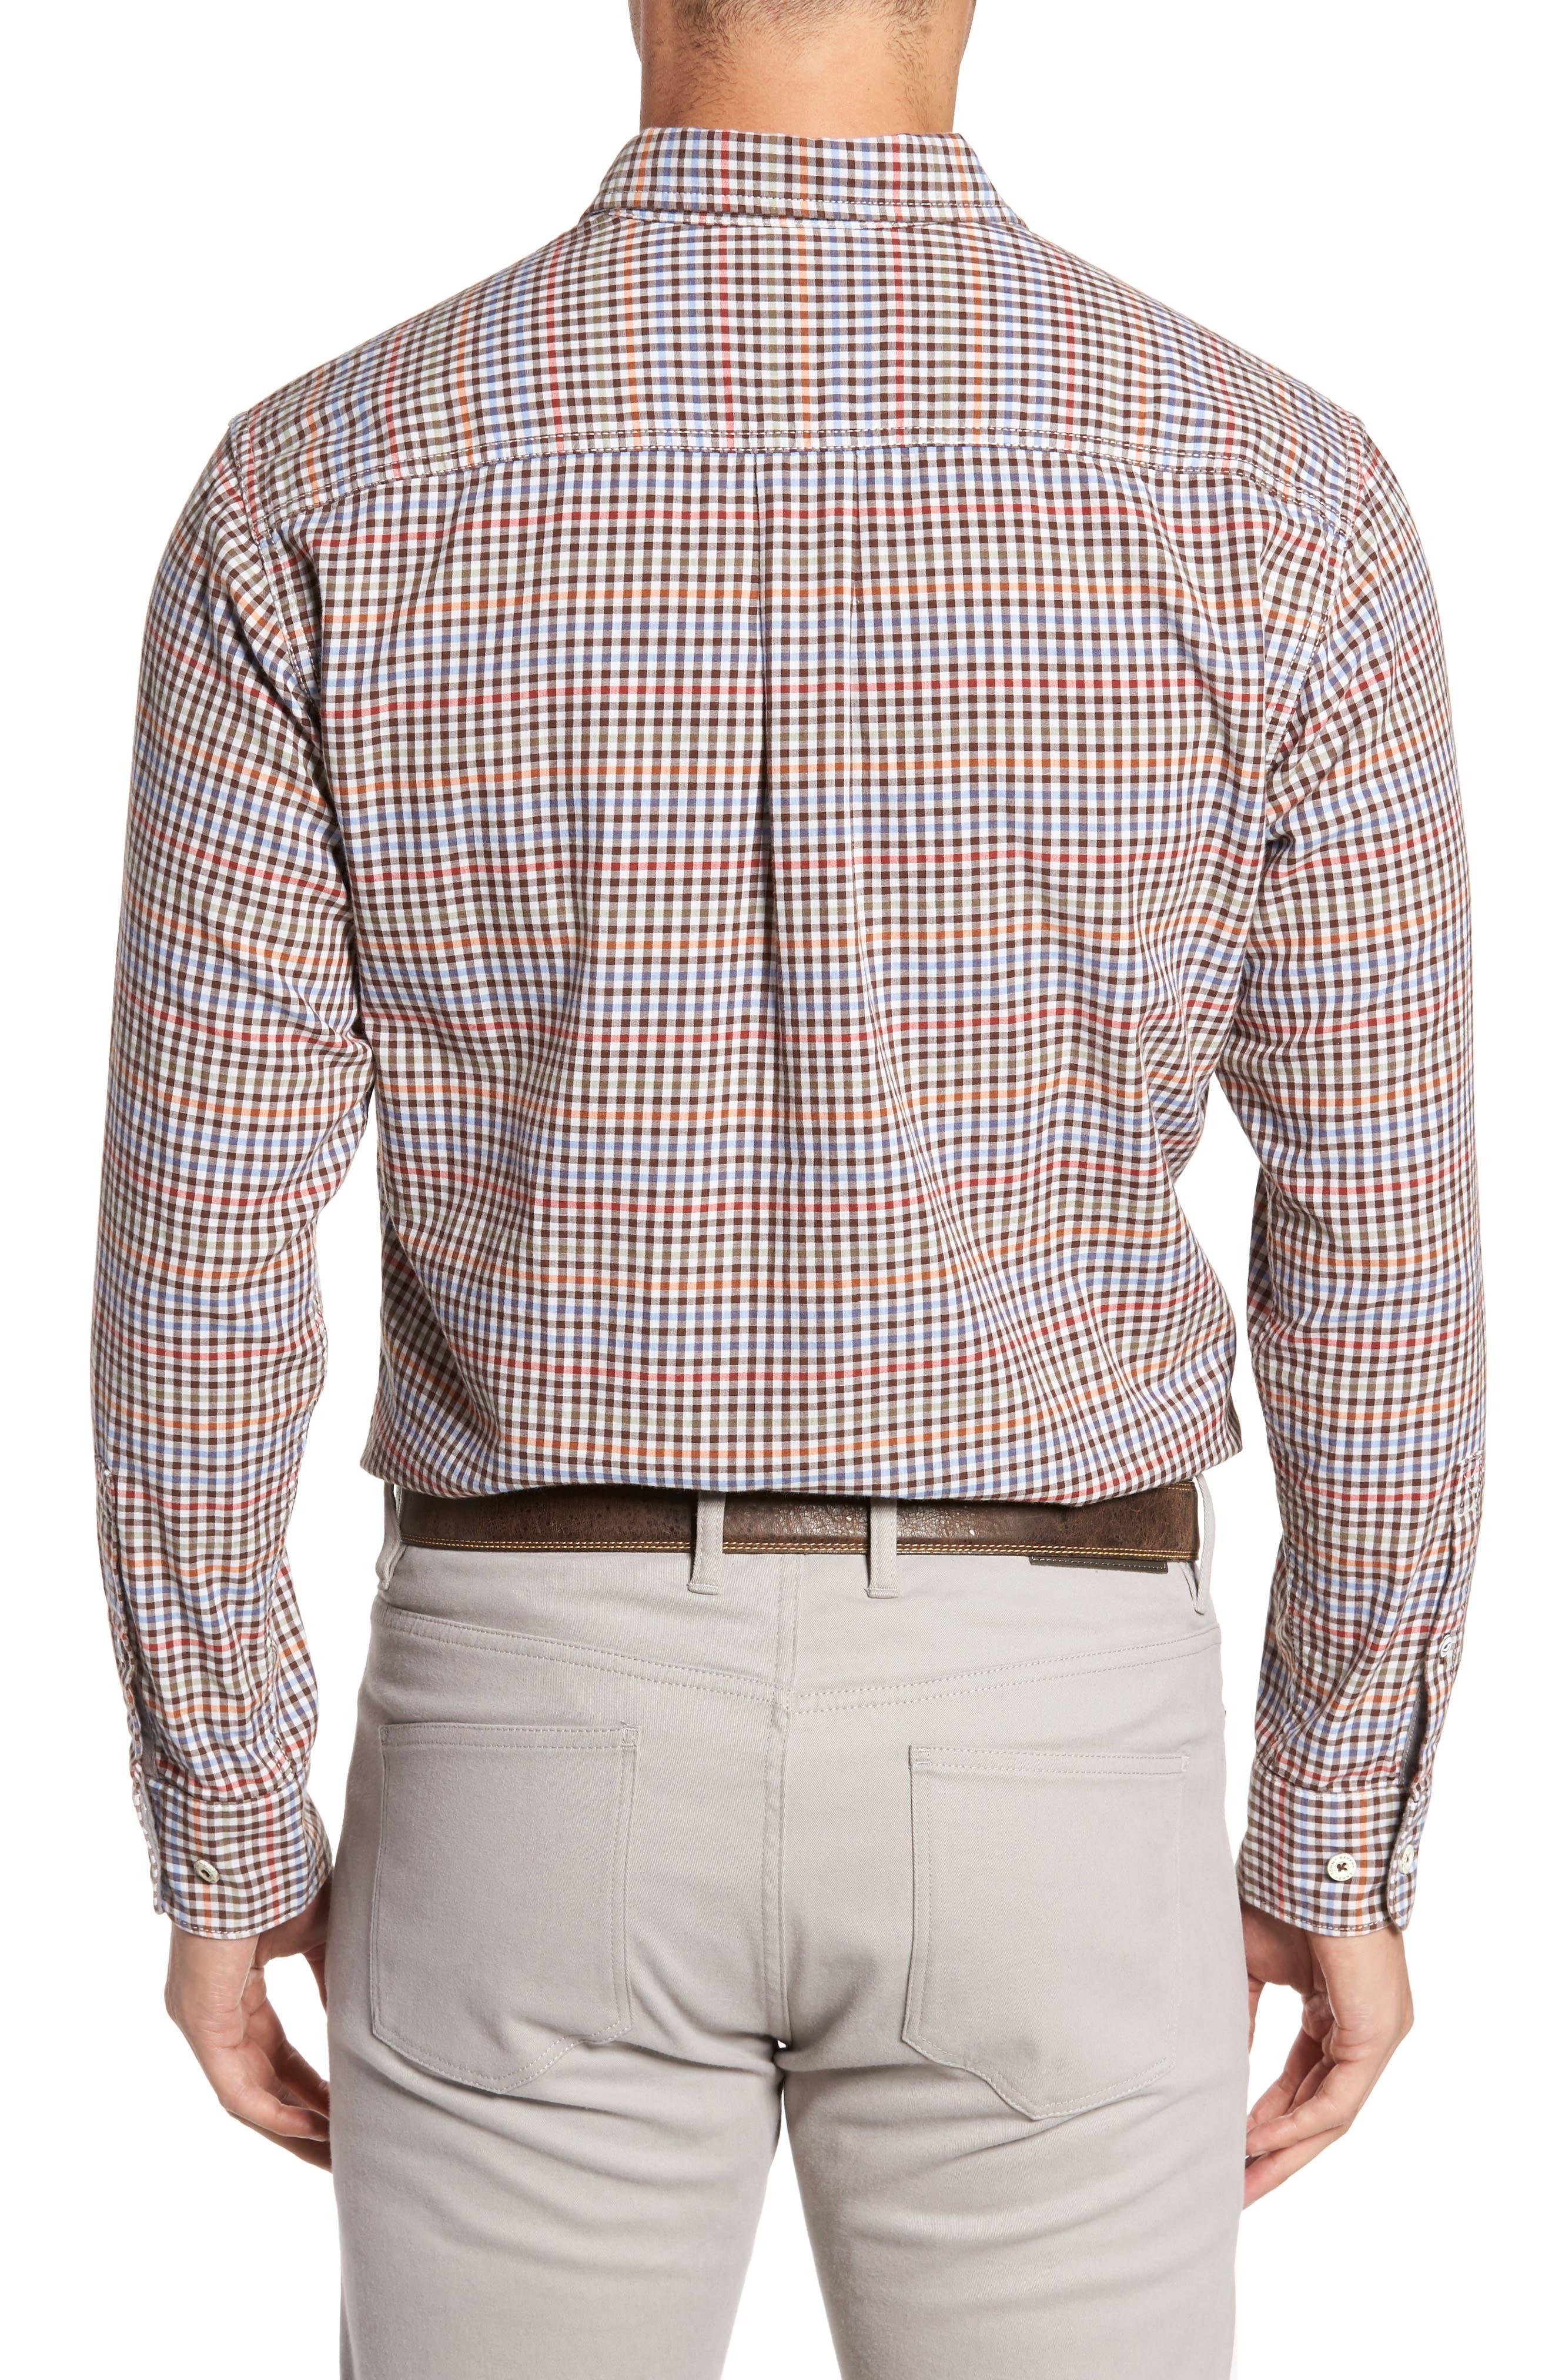 Tan Tan Regular Fit Check Sport Shirt,                             Alternate thumbnail 2, color,                             050